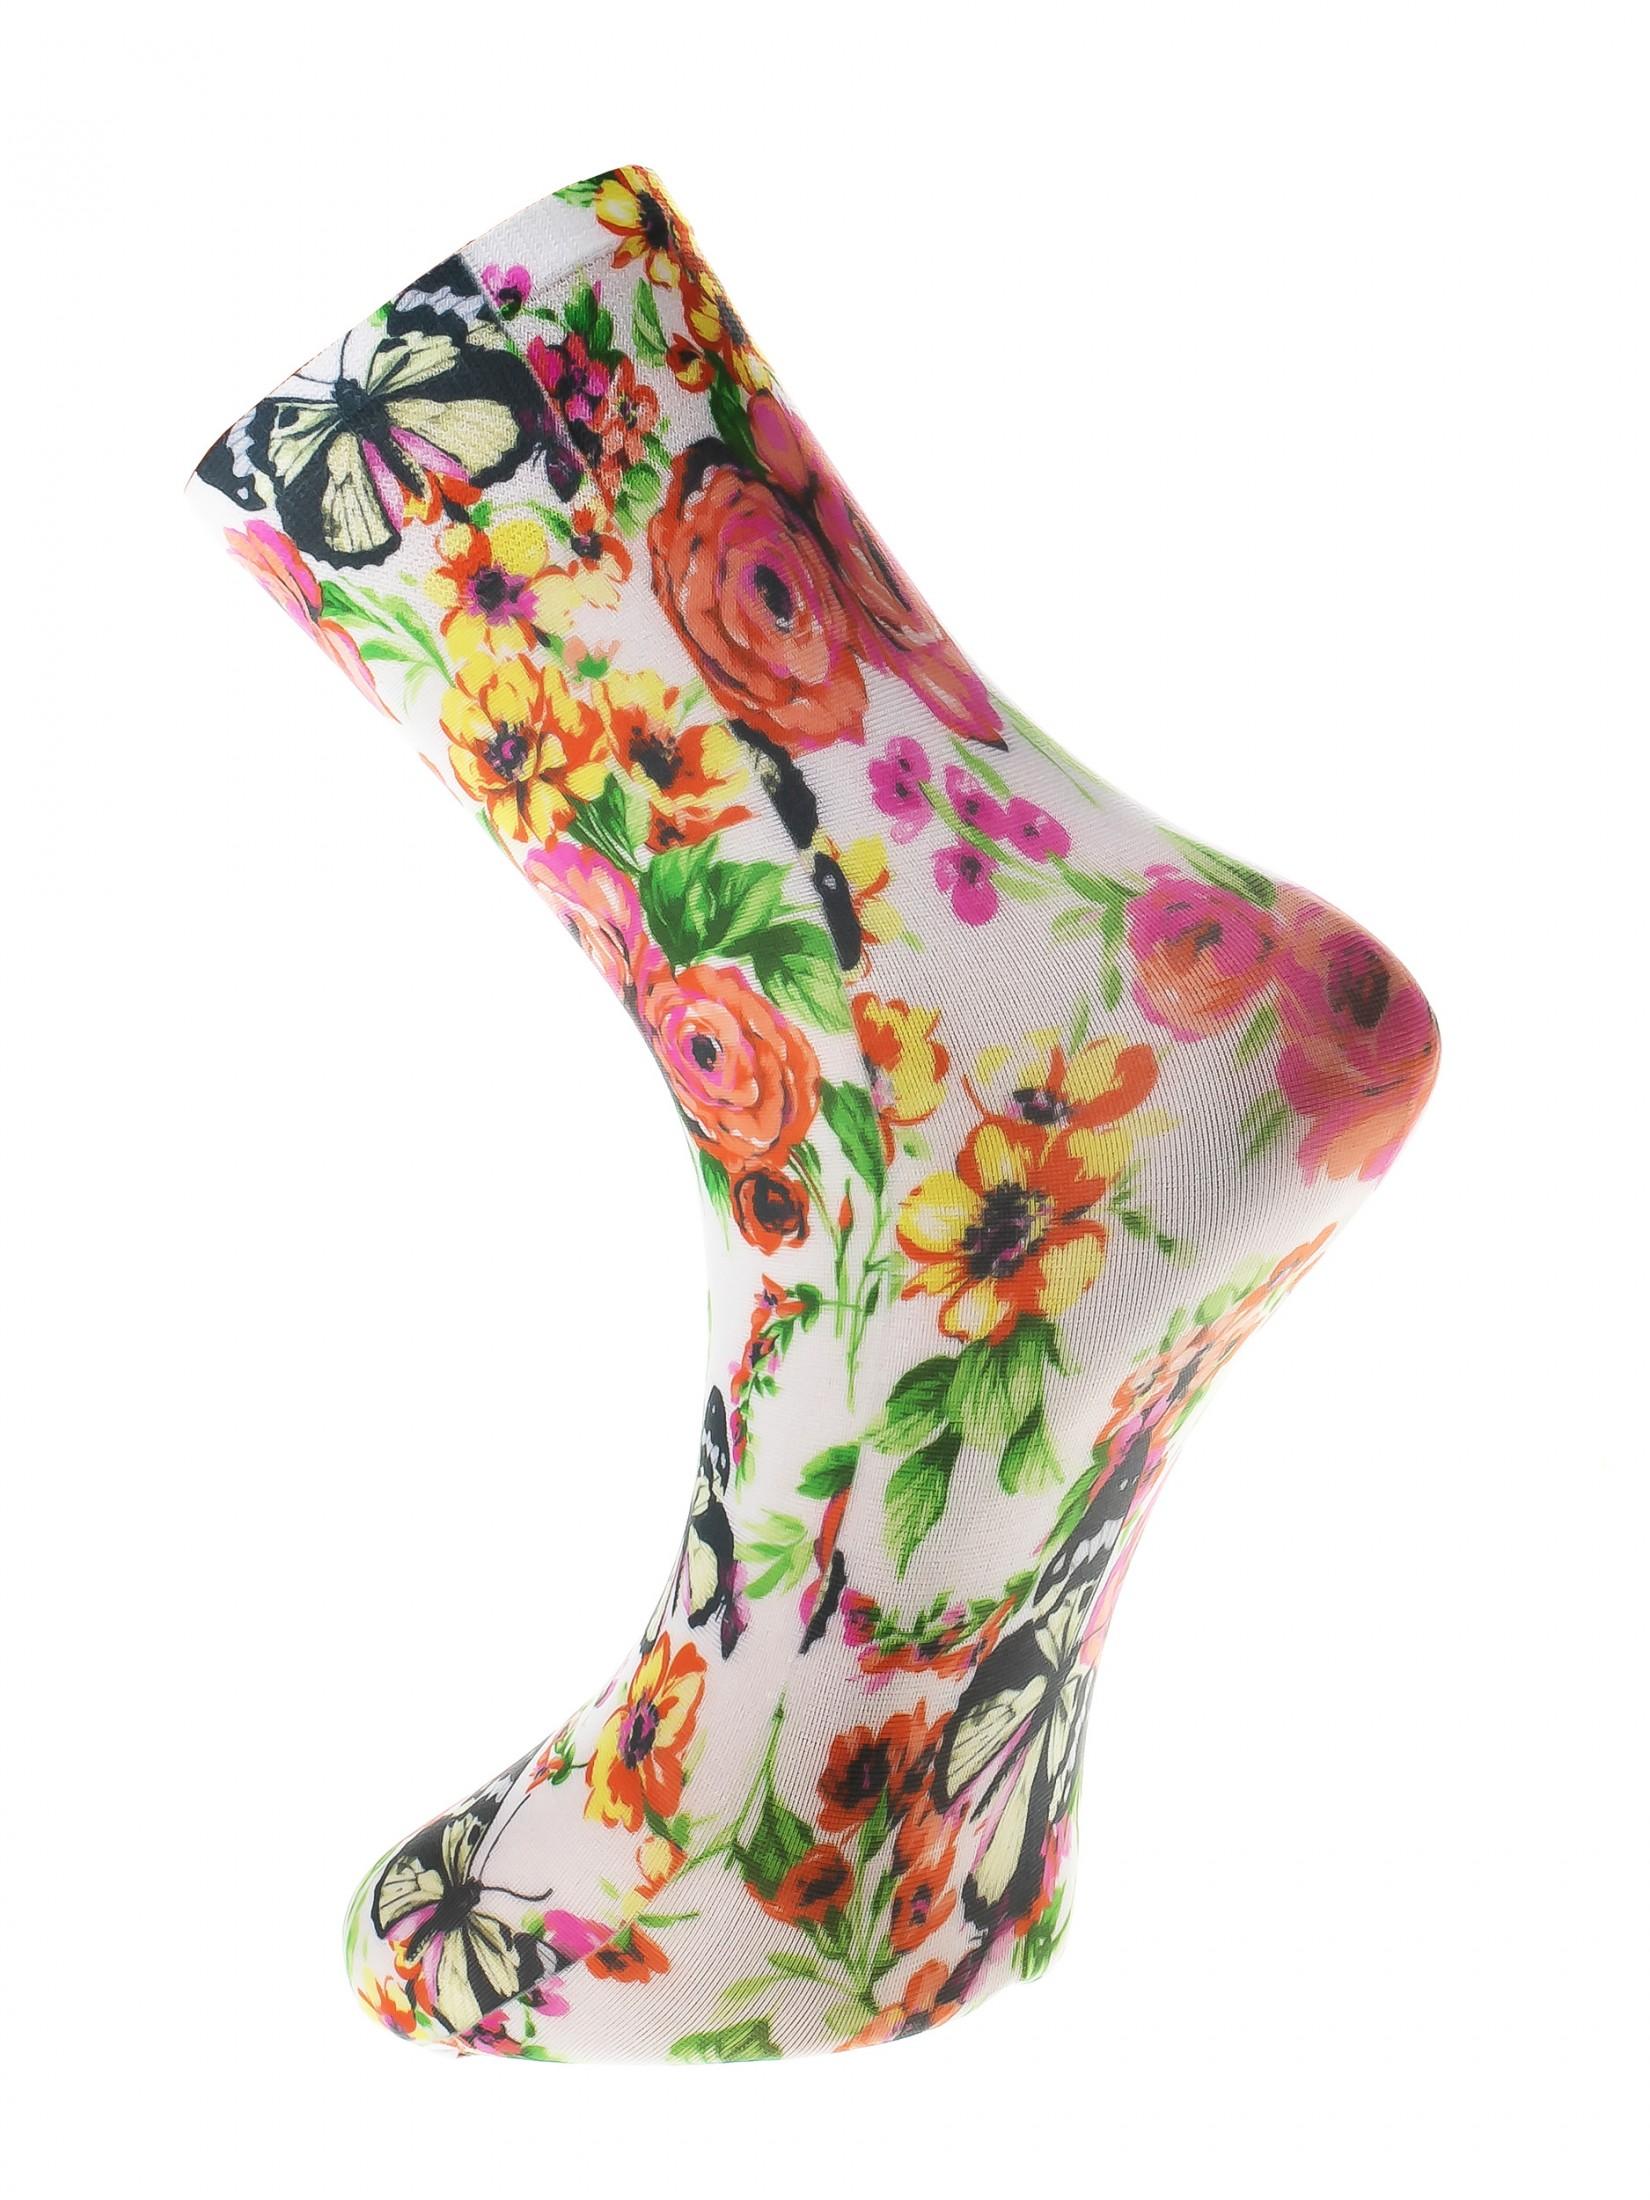 Носки женские Mademoiselle Tartu (c.) разноцветные UNICA